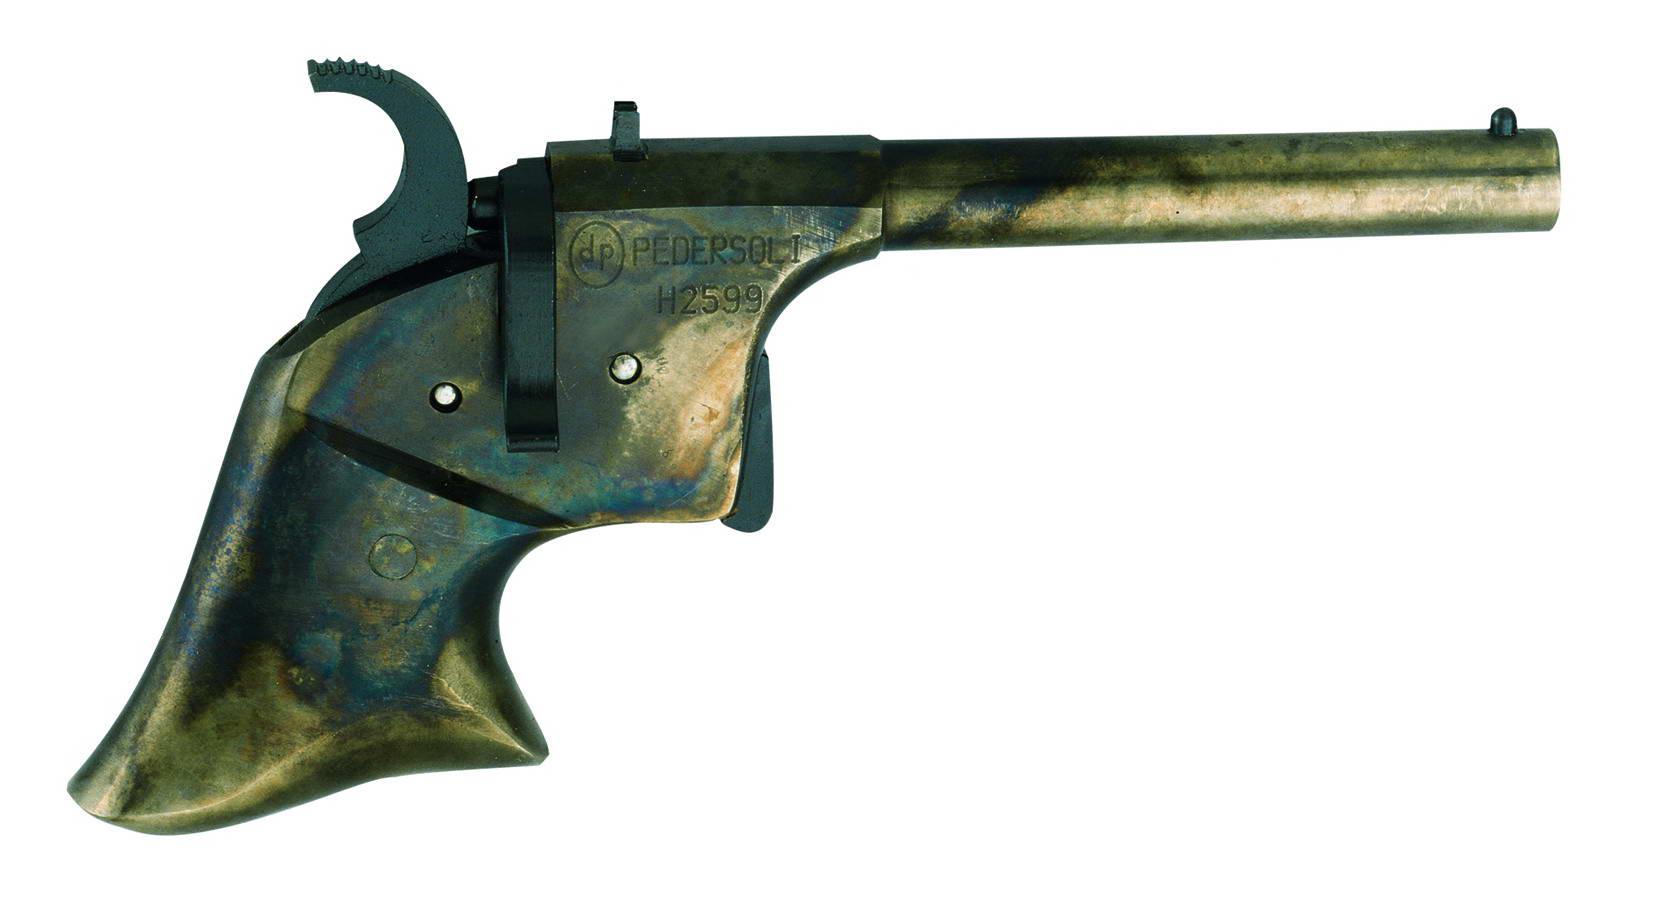 Cherry's Pedersoli pistol page